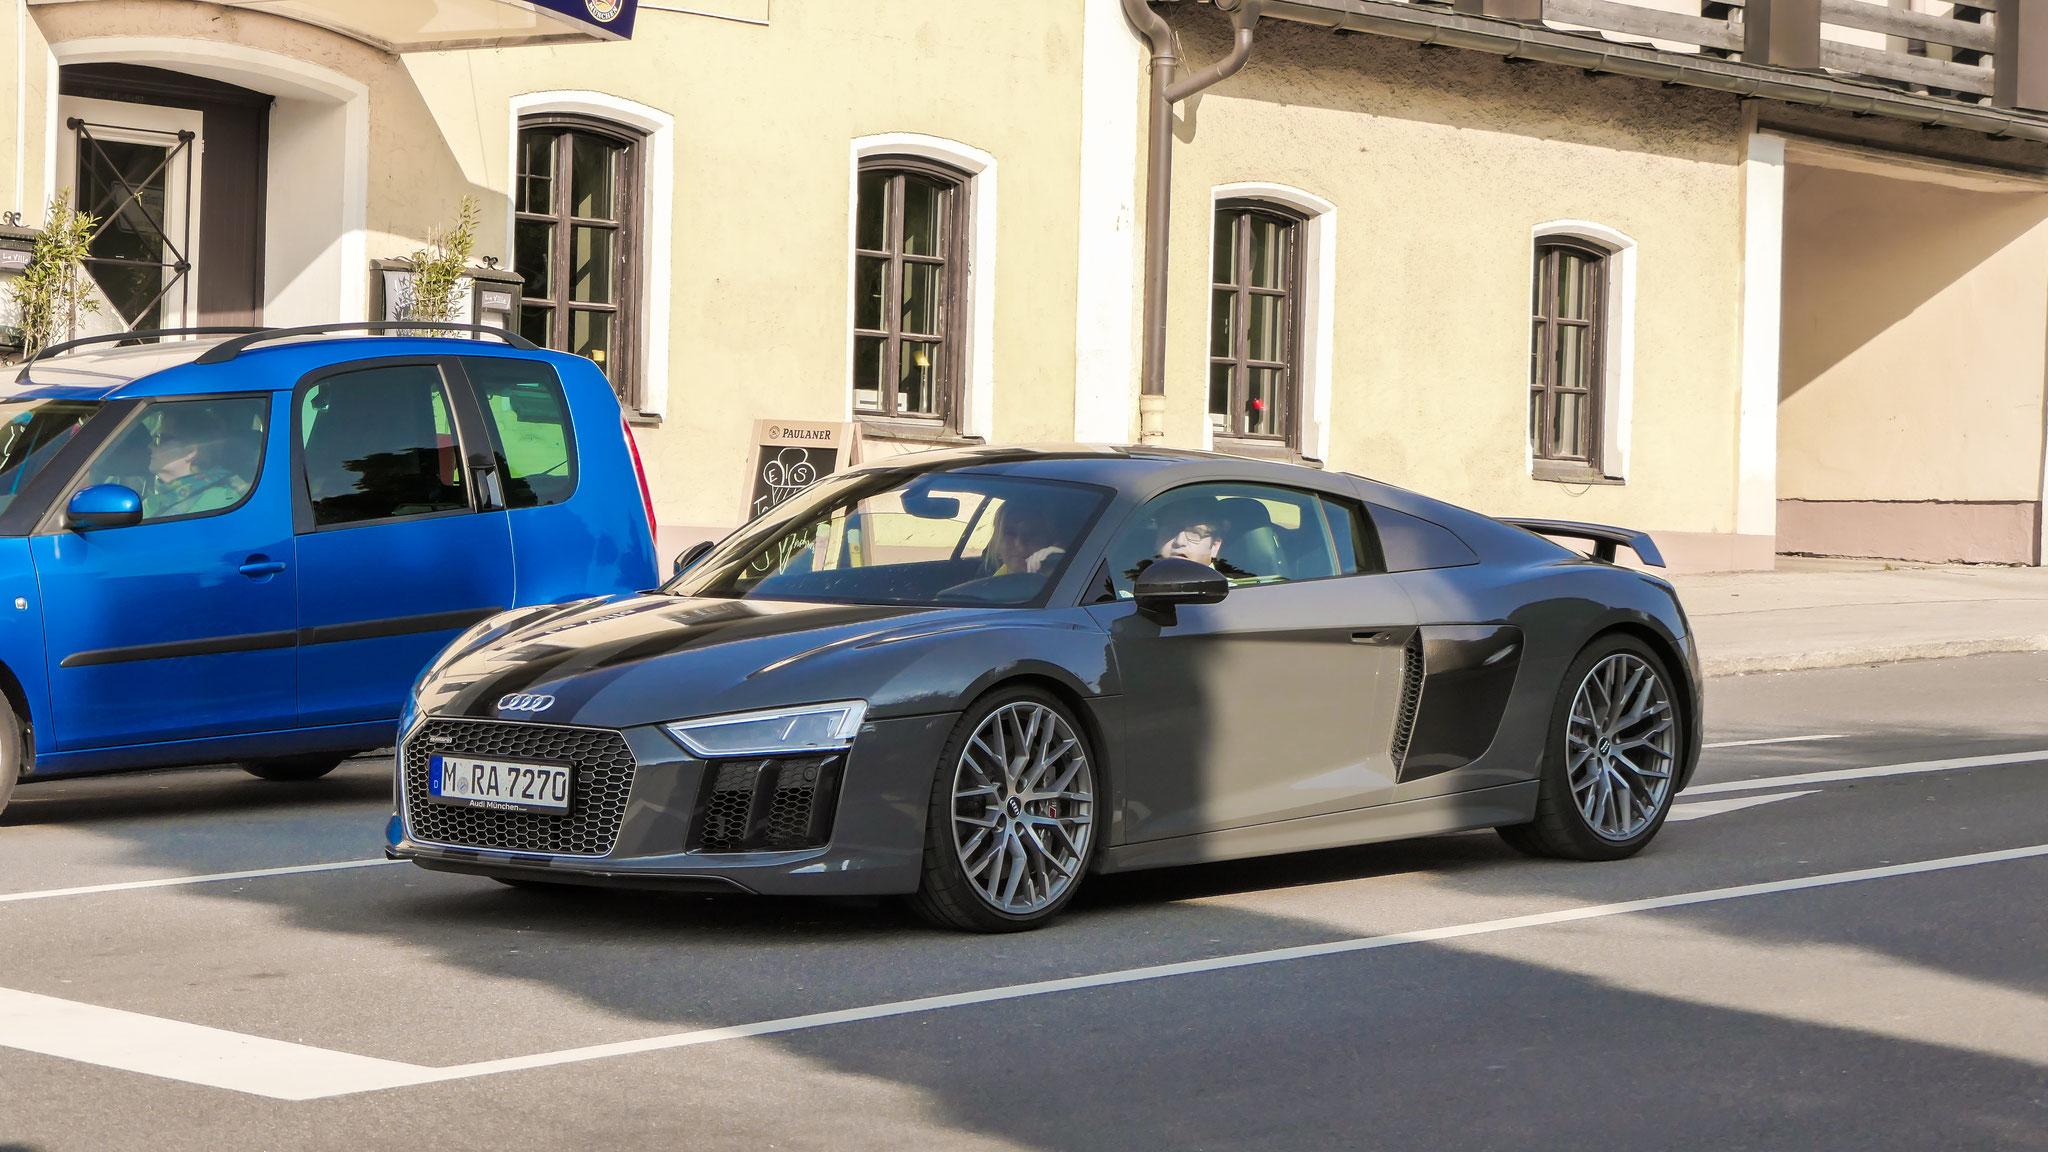 Audi R8 V10 - M-RA-7270